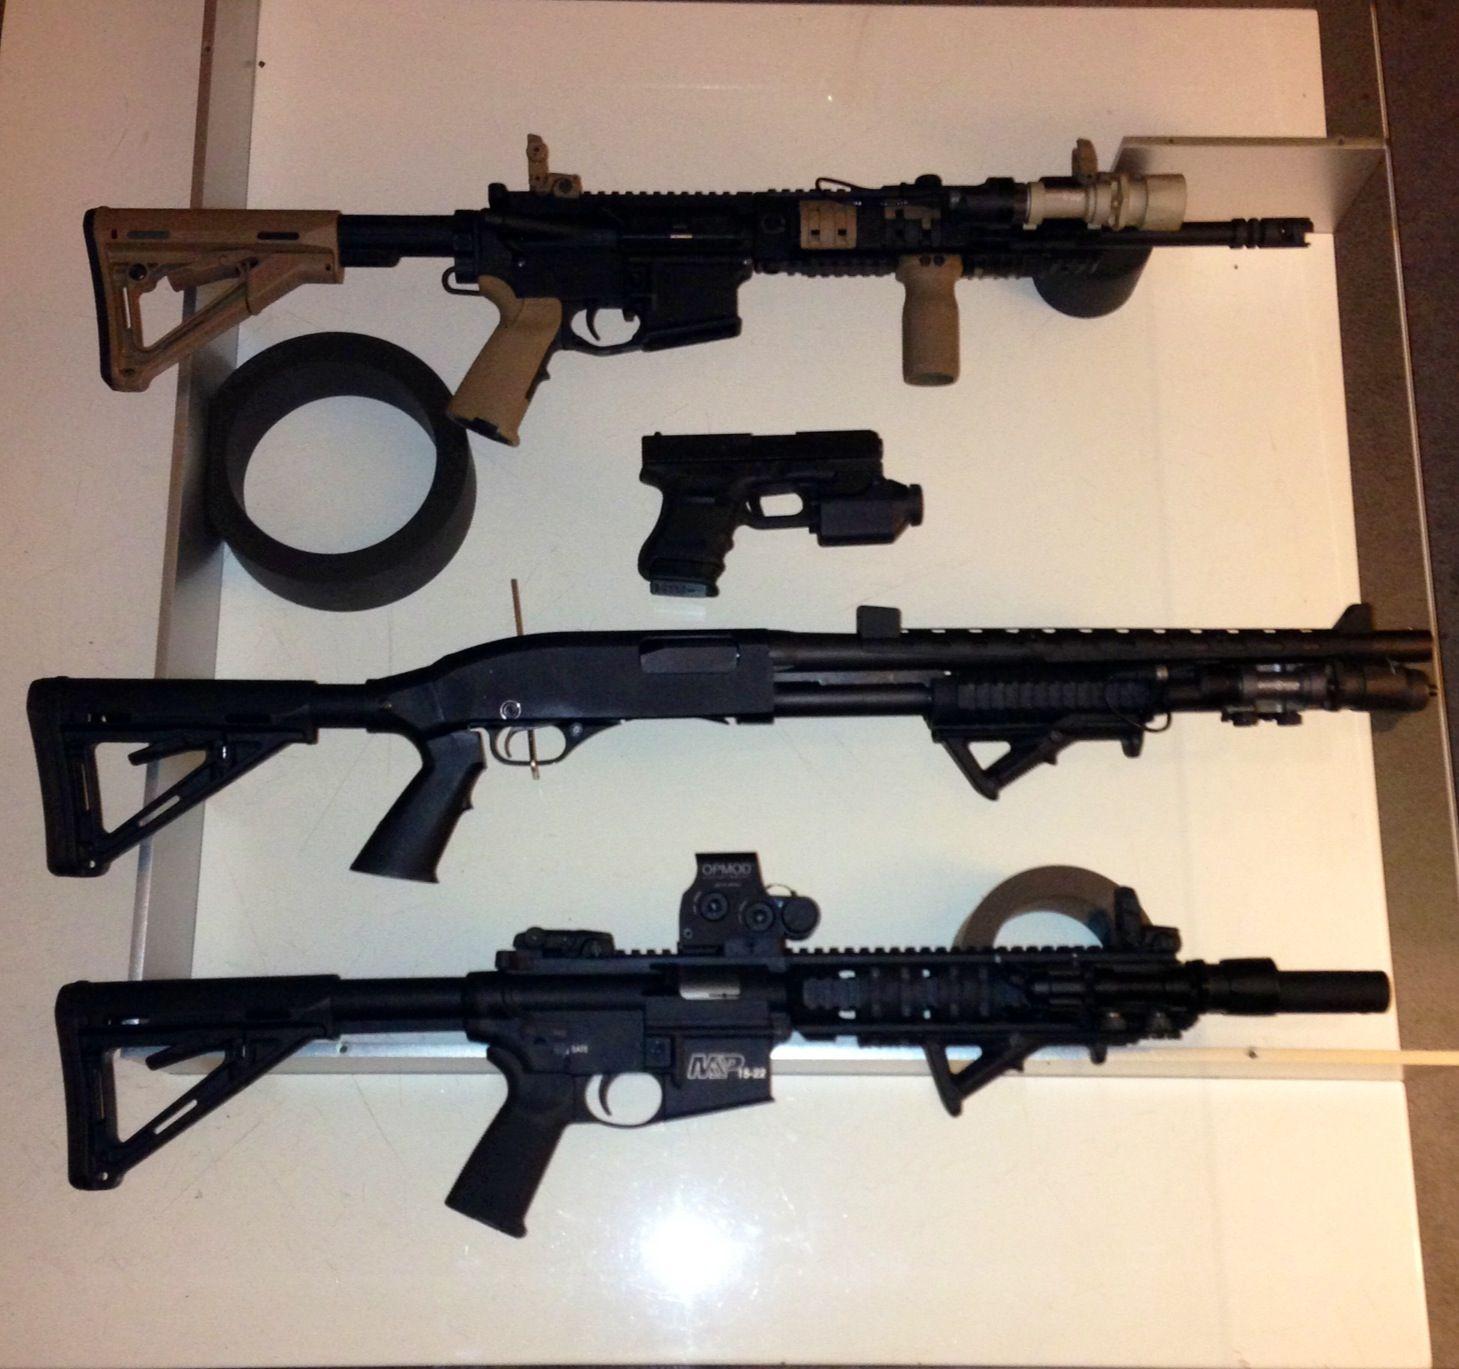 #homeprotection#guns#dumpNled